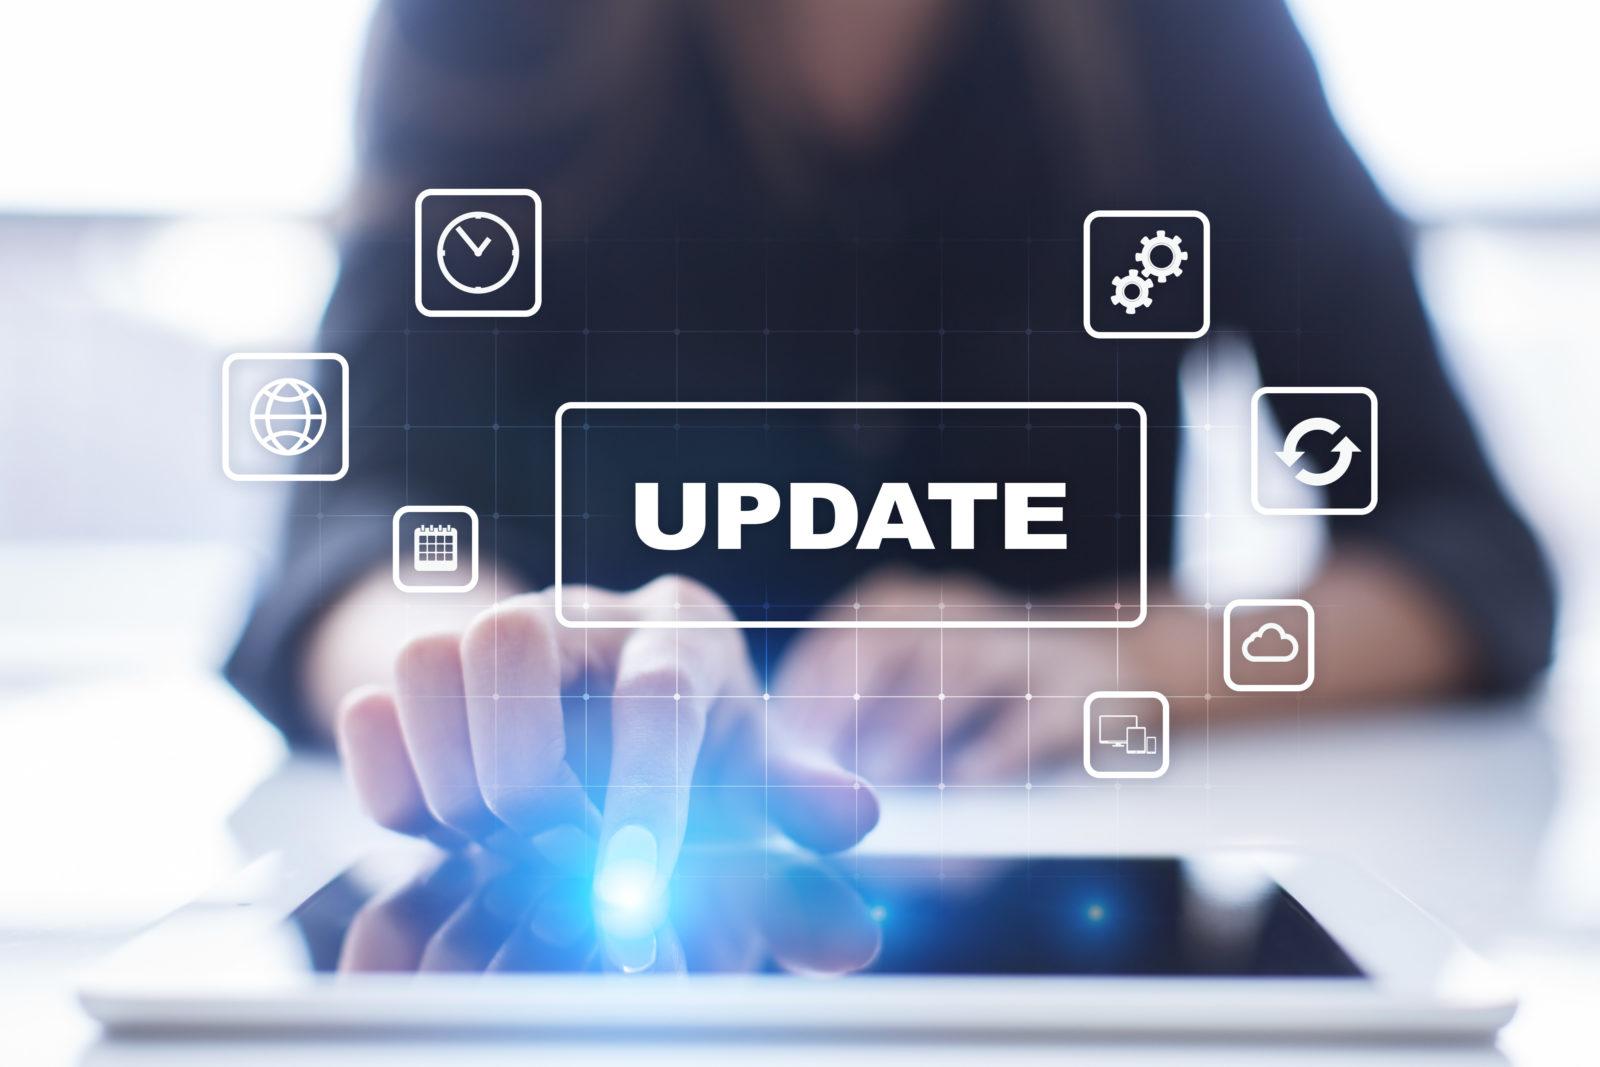 Bullhorn product updates